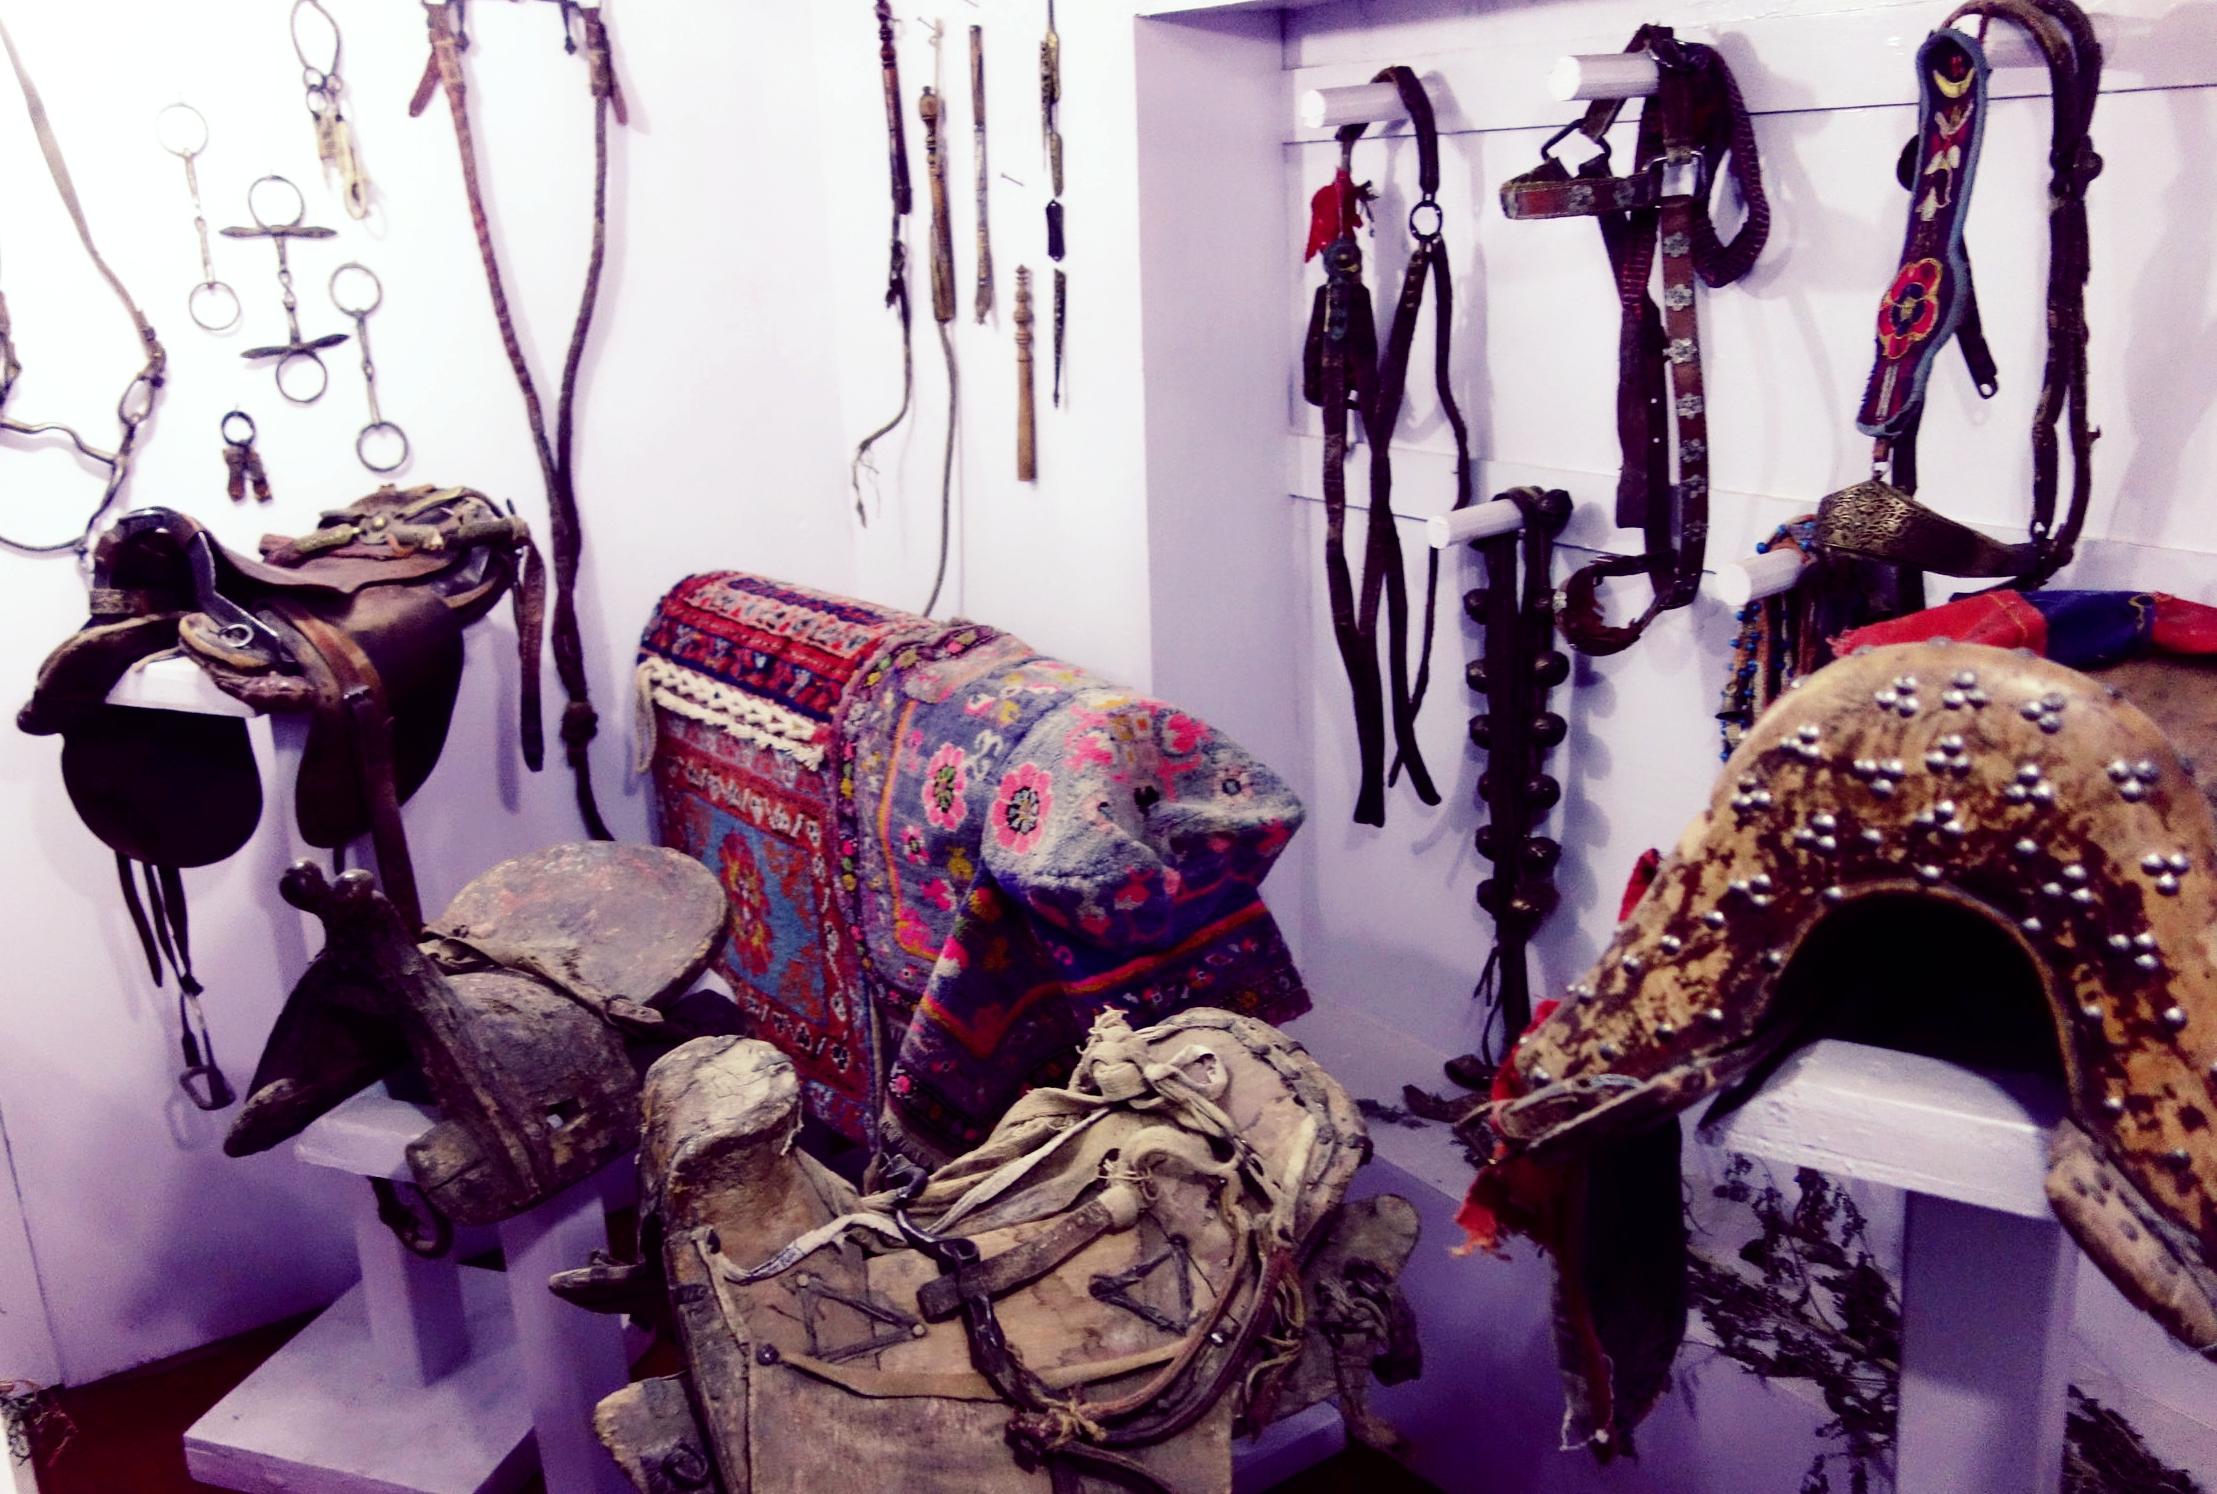 Horse Saddles from various Central Asian Countries at display at the Munshi Aziz Bhatt Museum, Kargil